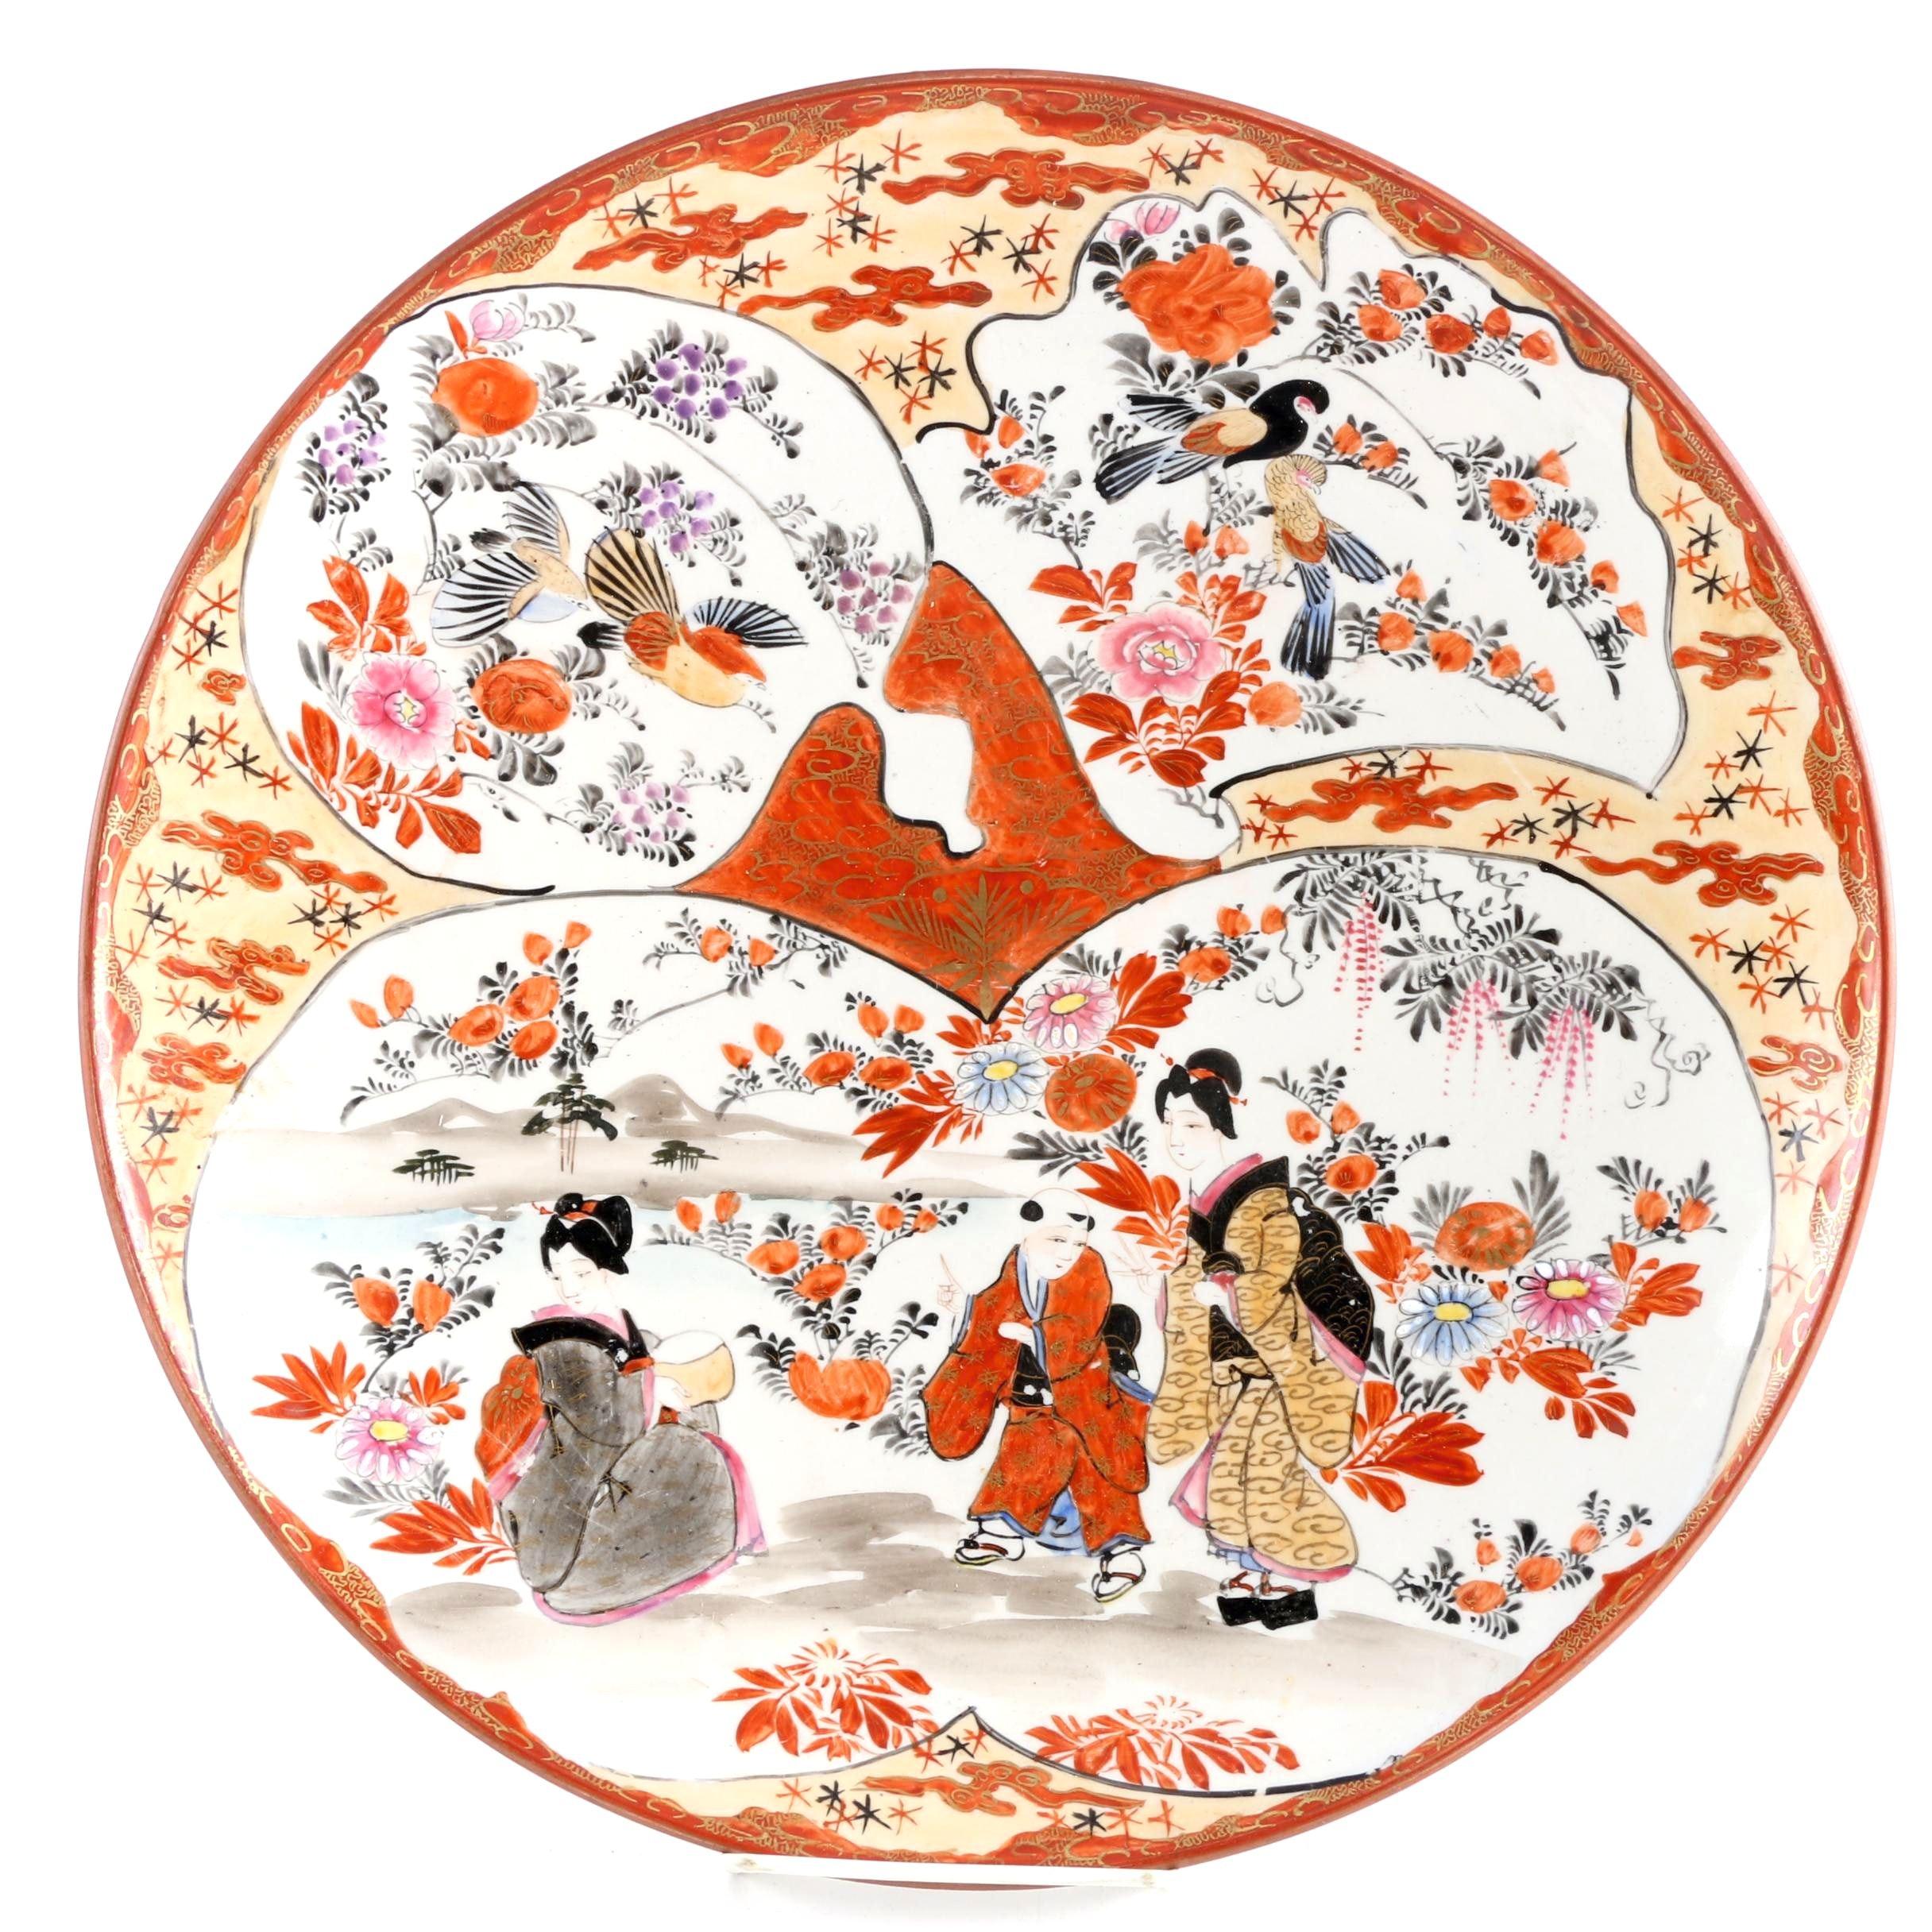 East Asian Porcelain Plate